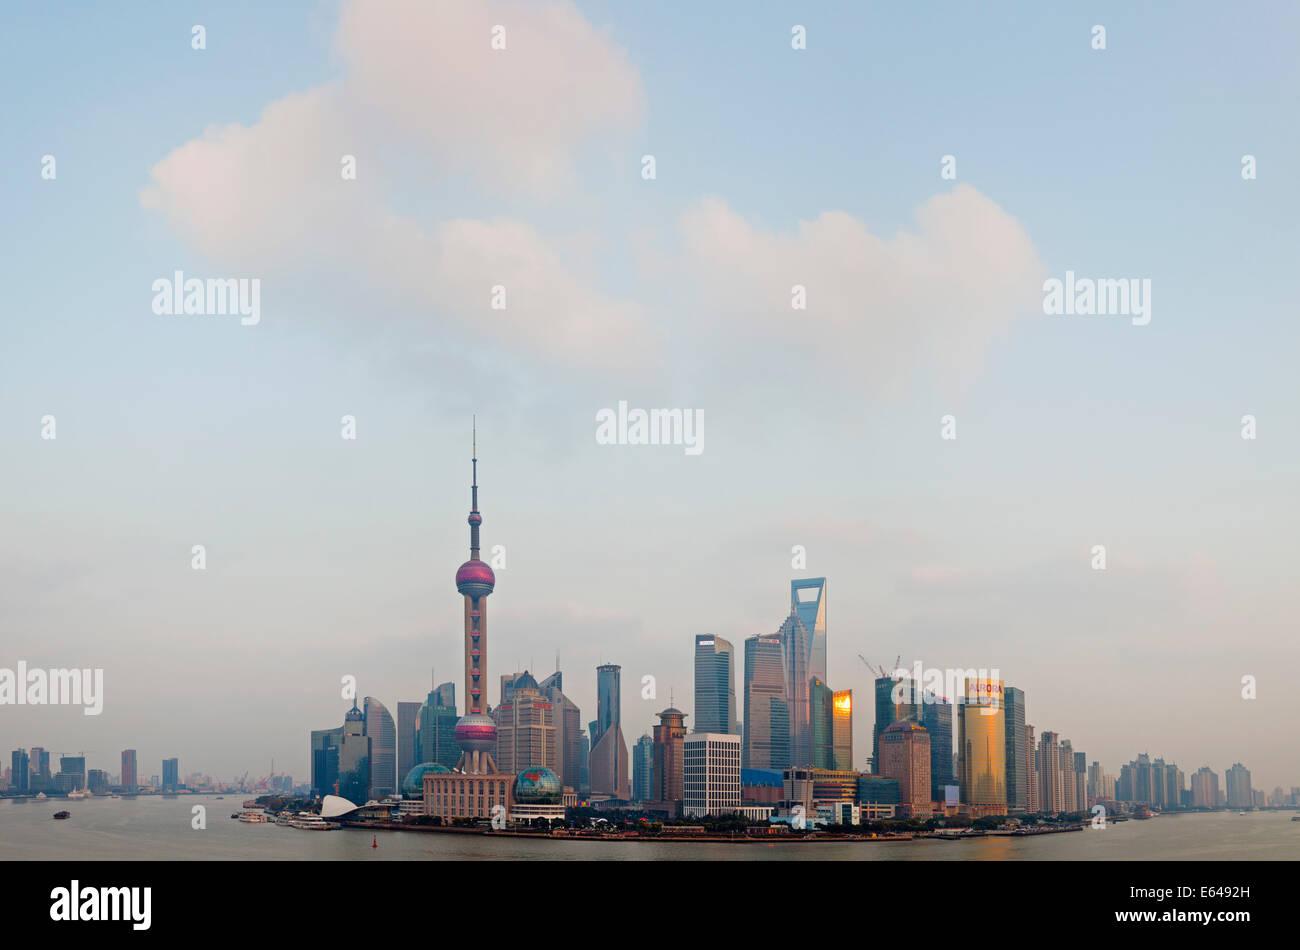 Lo skyline di Pudong & Fiume Huangpu, Shanghai, Cina Immagini Stock